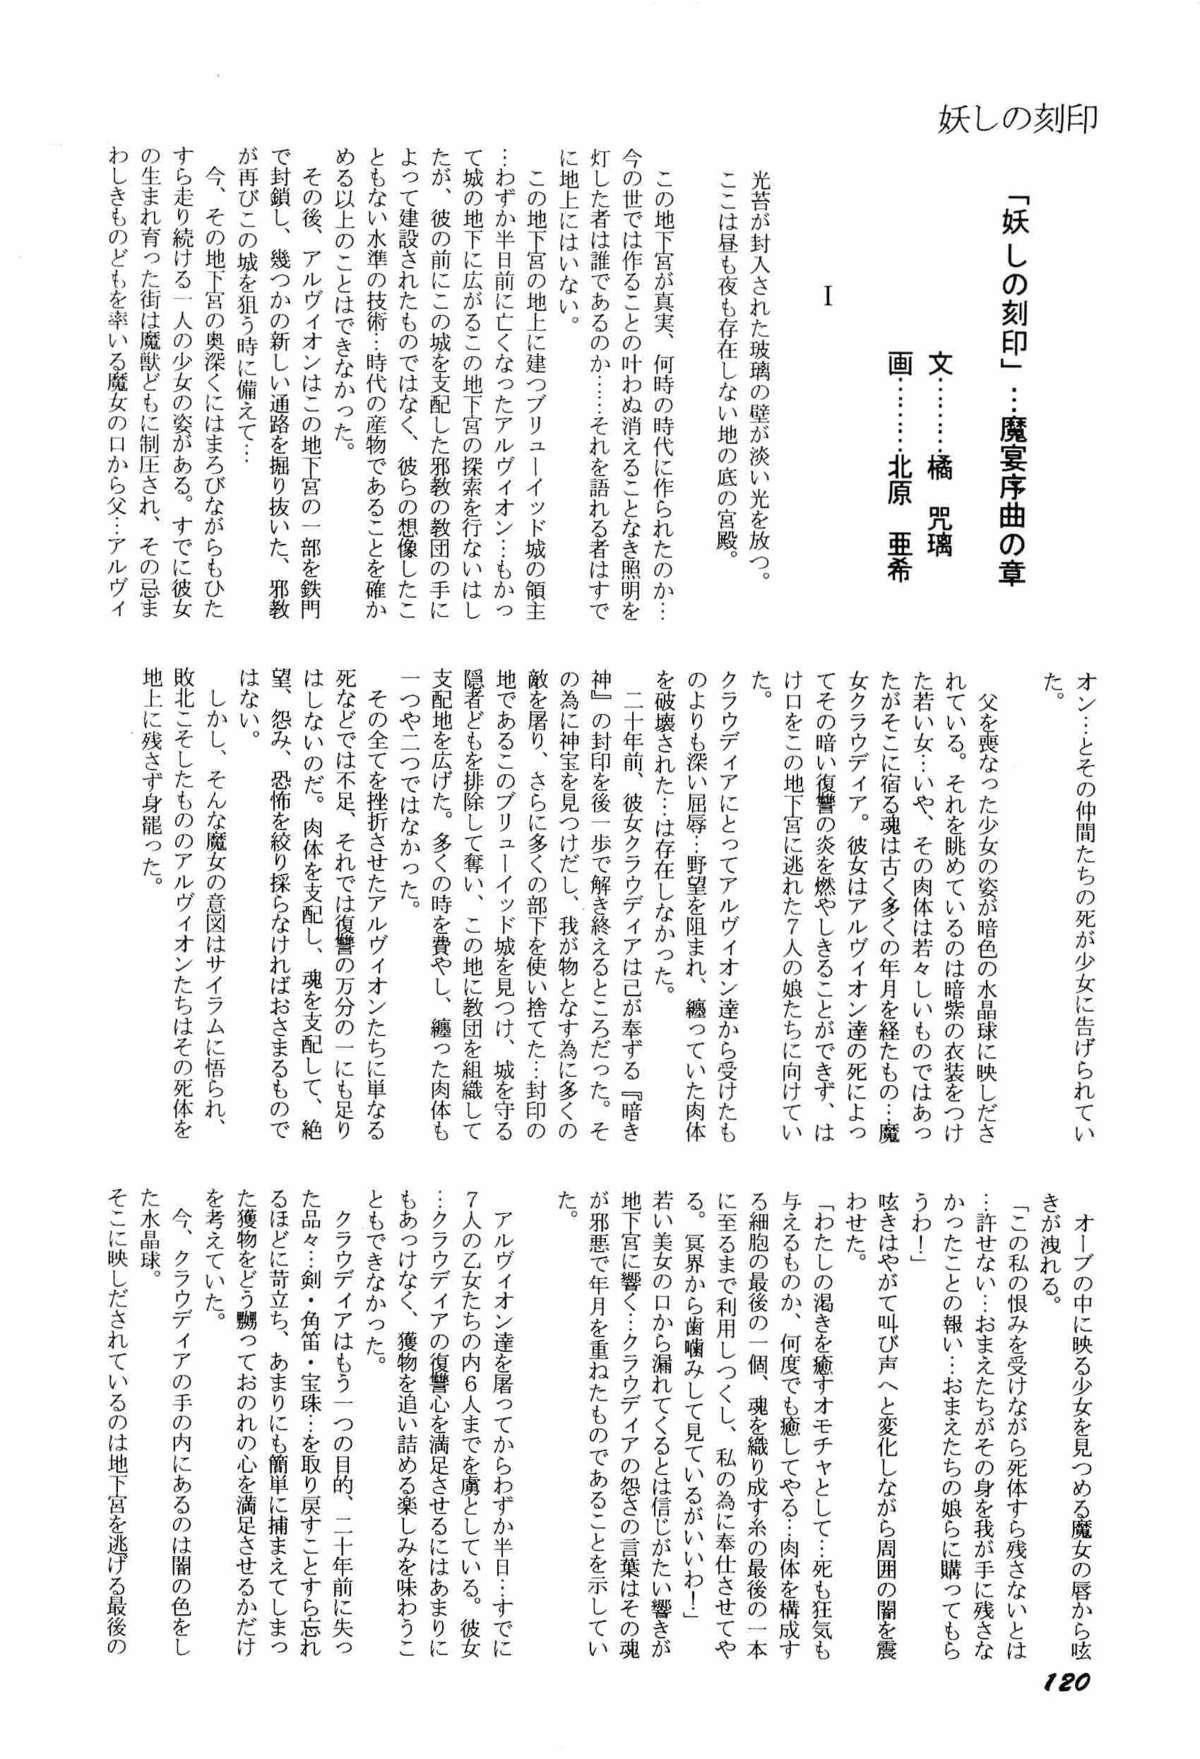 Bisyoujo Anthology '93 jyoukan 122